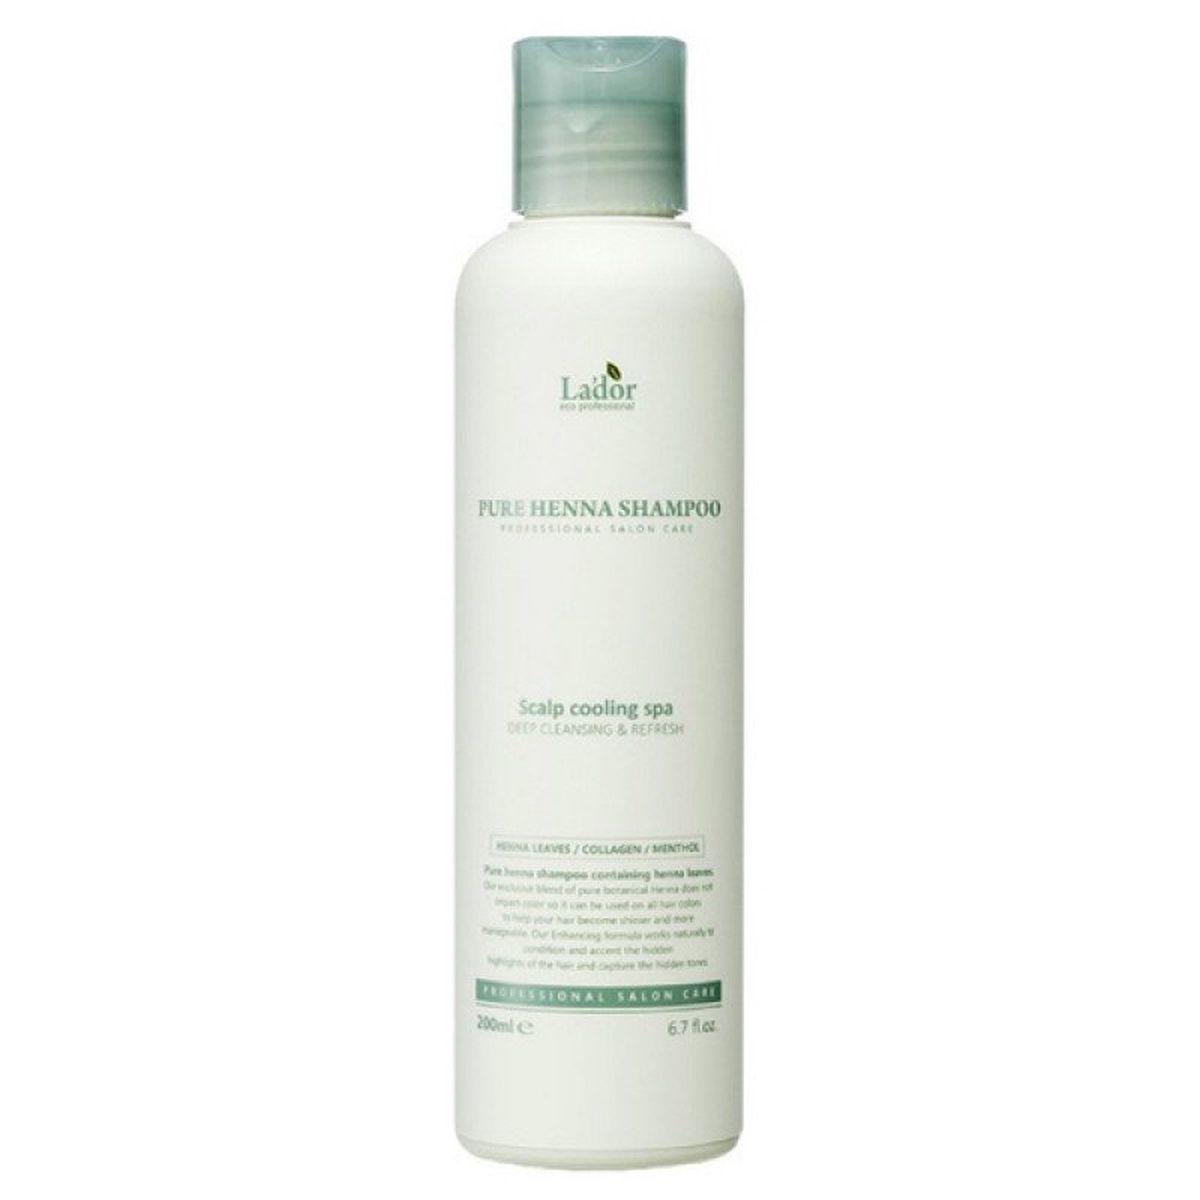 Укрепляющий шампунь с хной Lador Pure Henna Shampoo - 200 мл